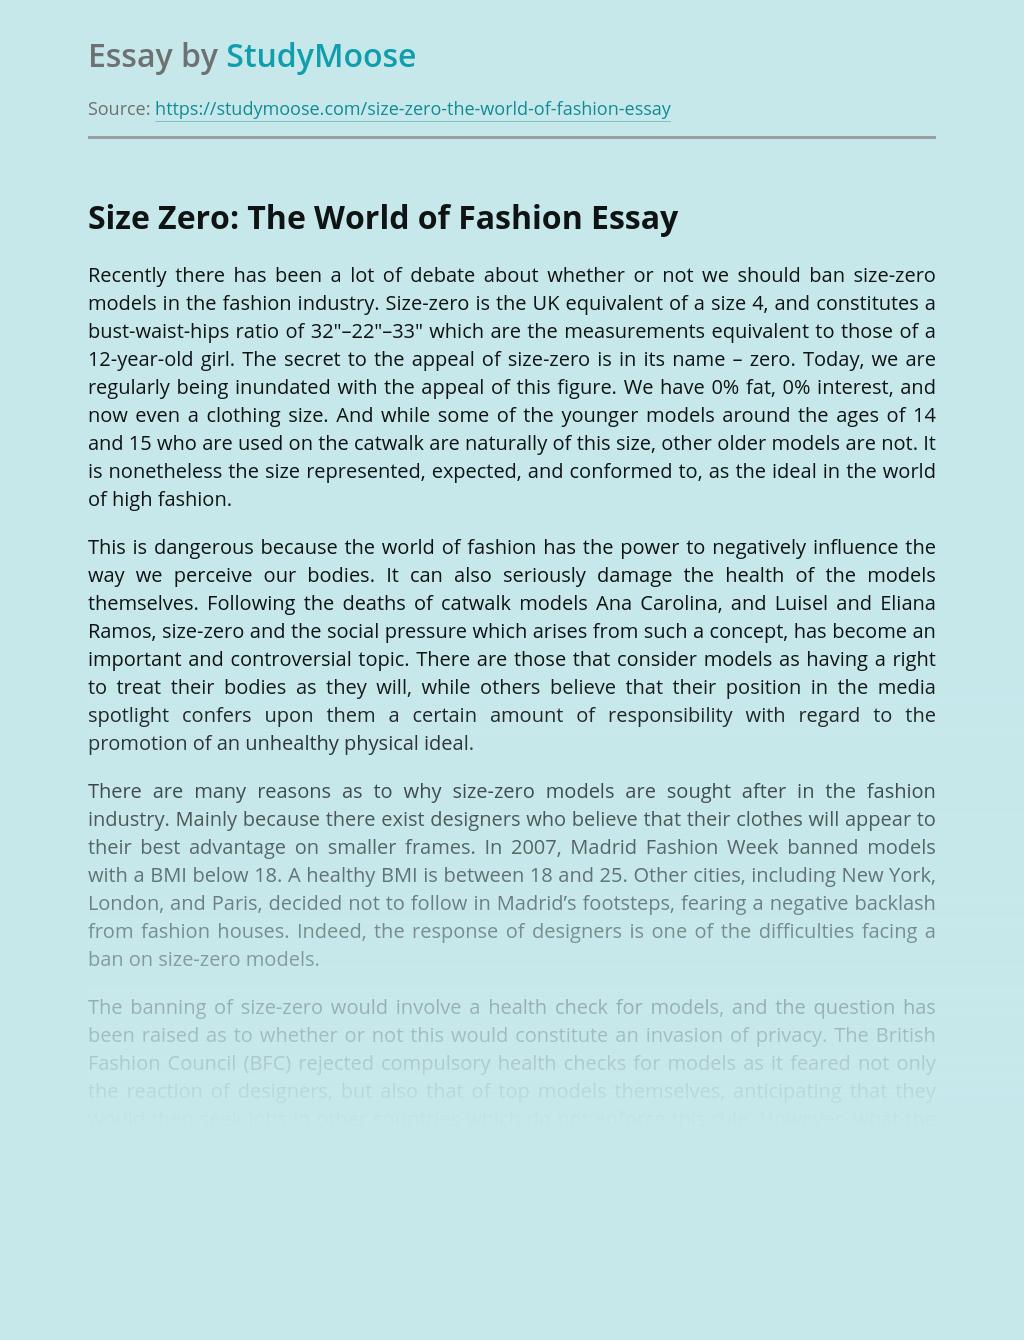 Size Zero: The World of Fashion